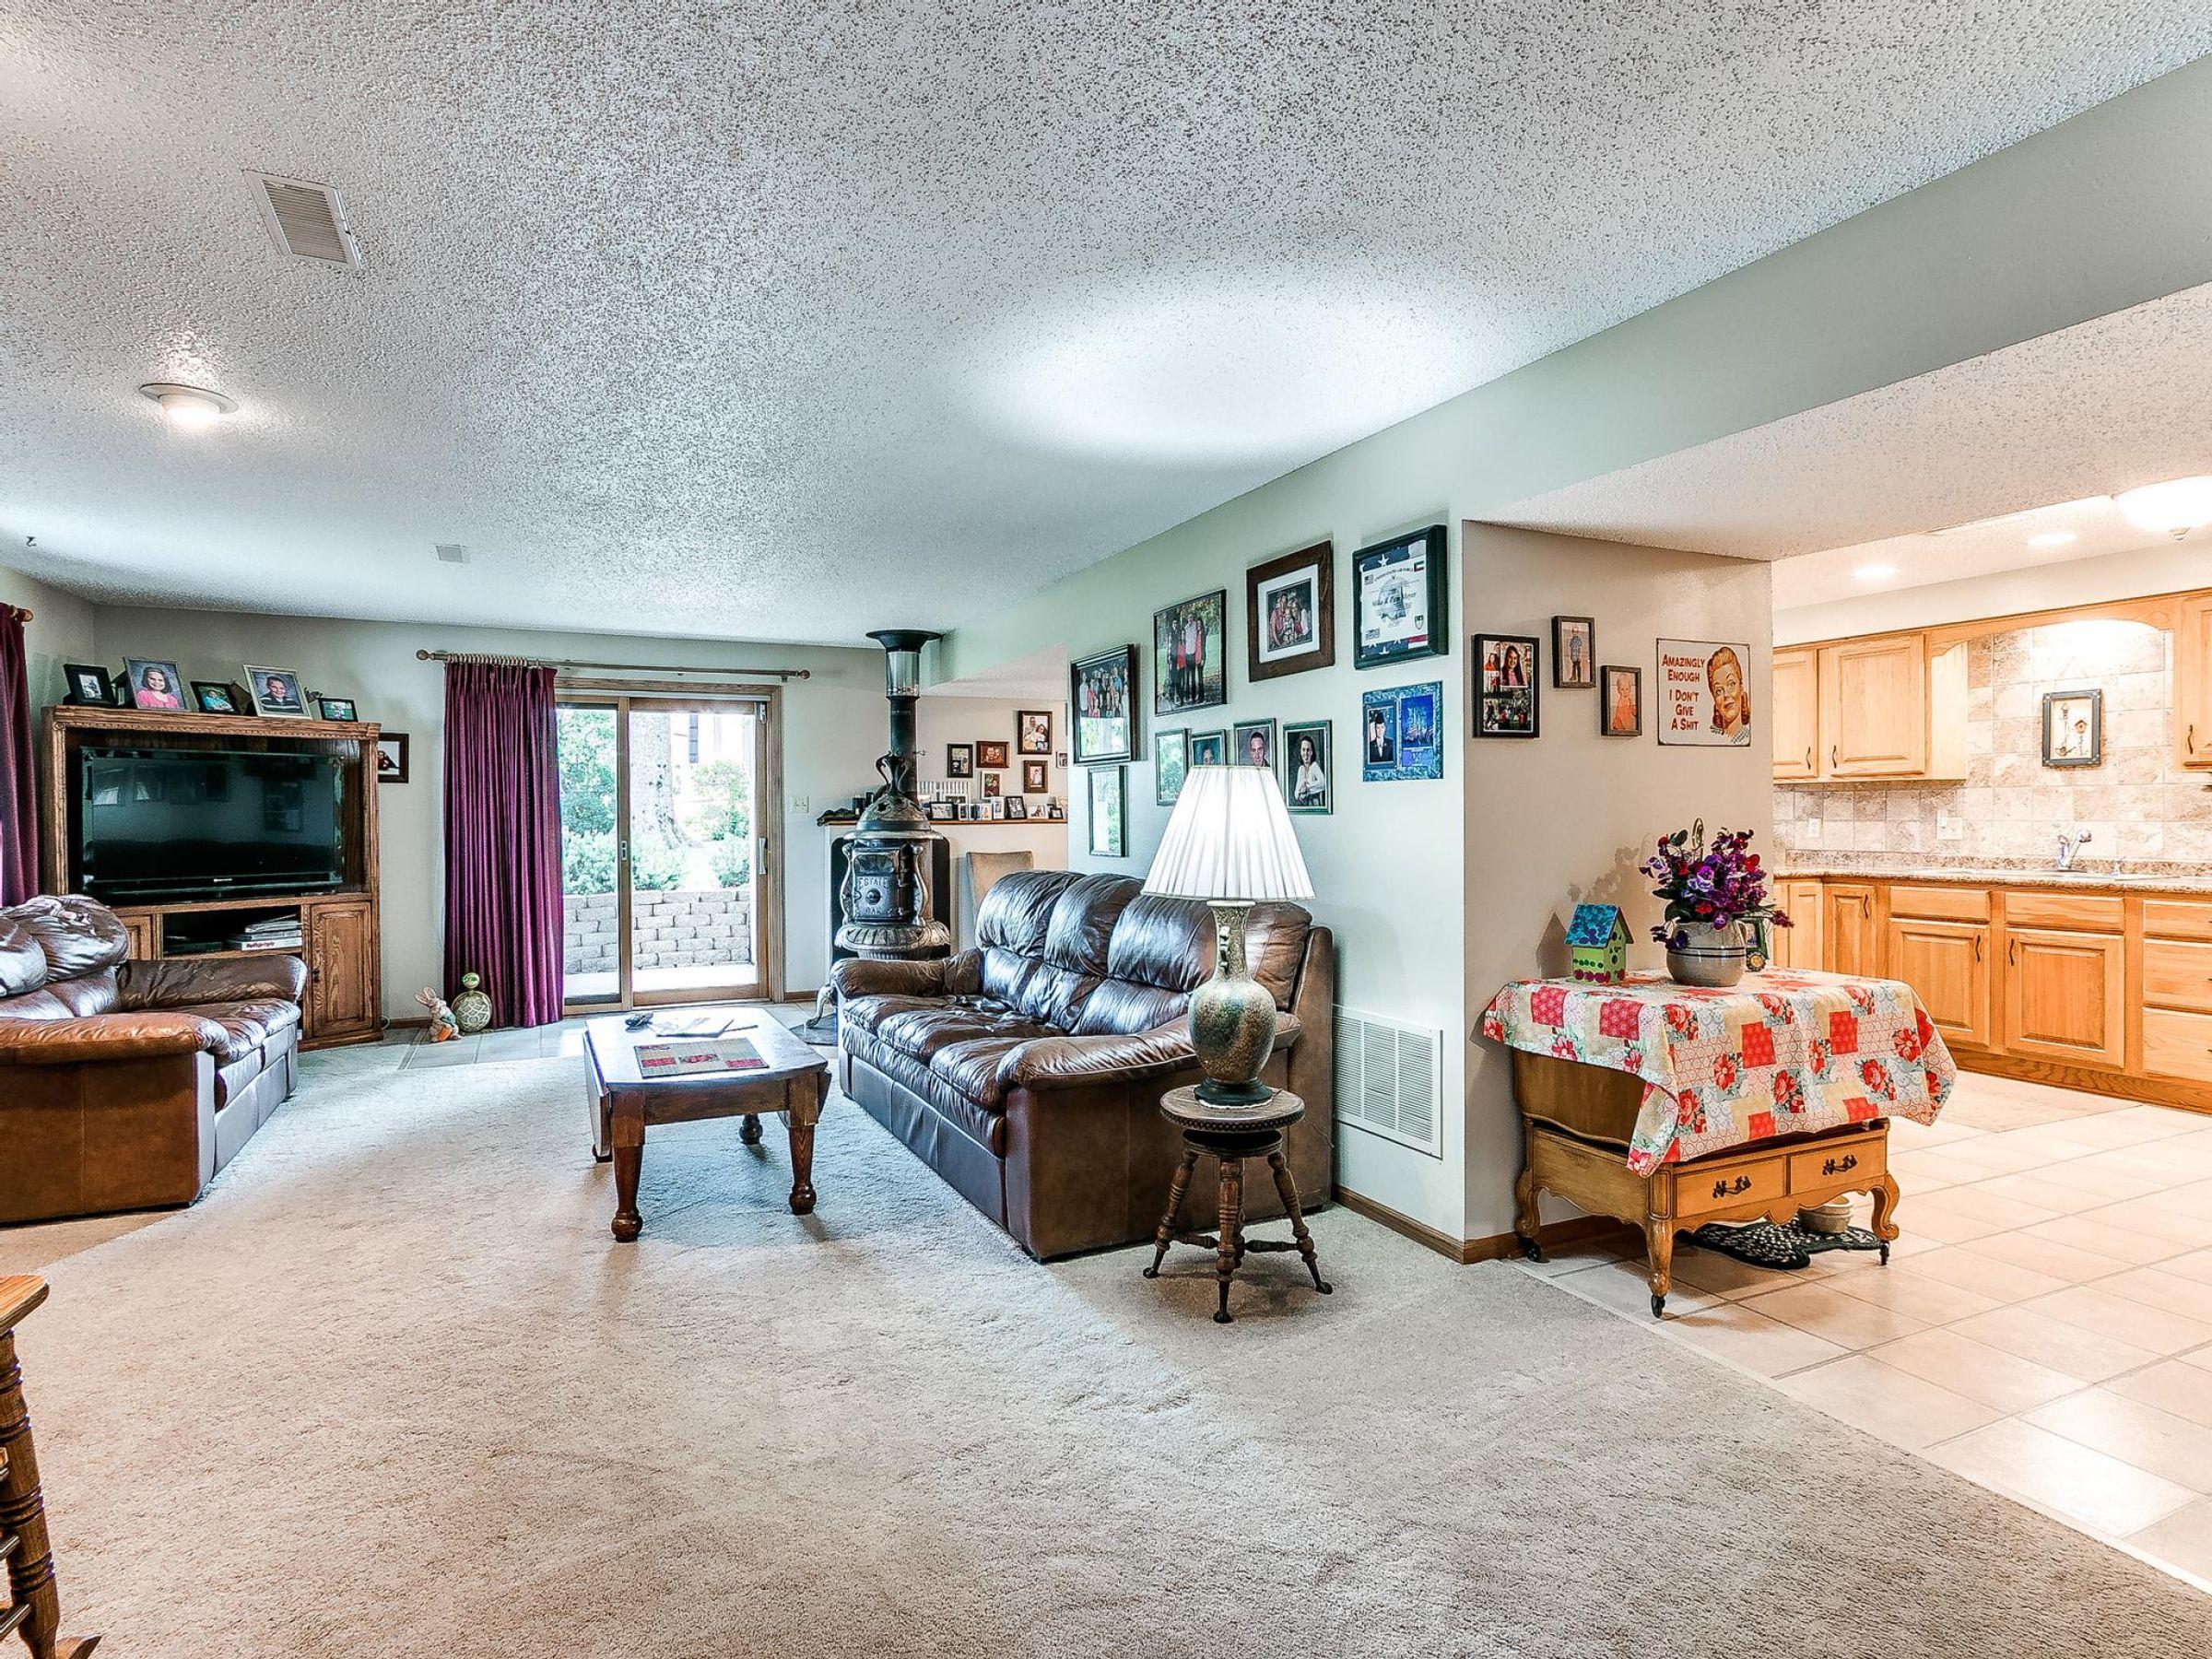 residential-warren-county-iowa-3-acres-listing-number-15593-2-2021-06-18-155611.jpg